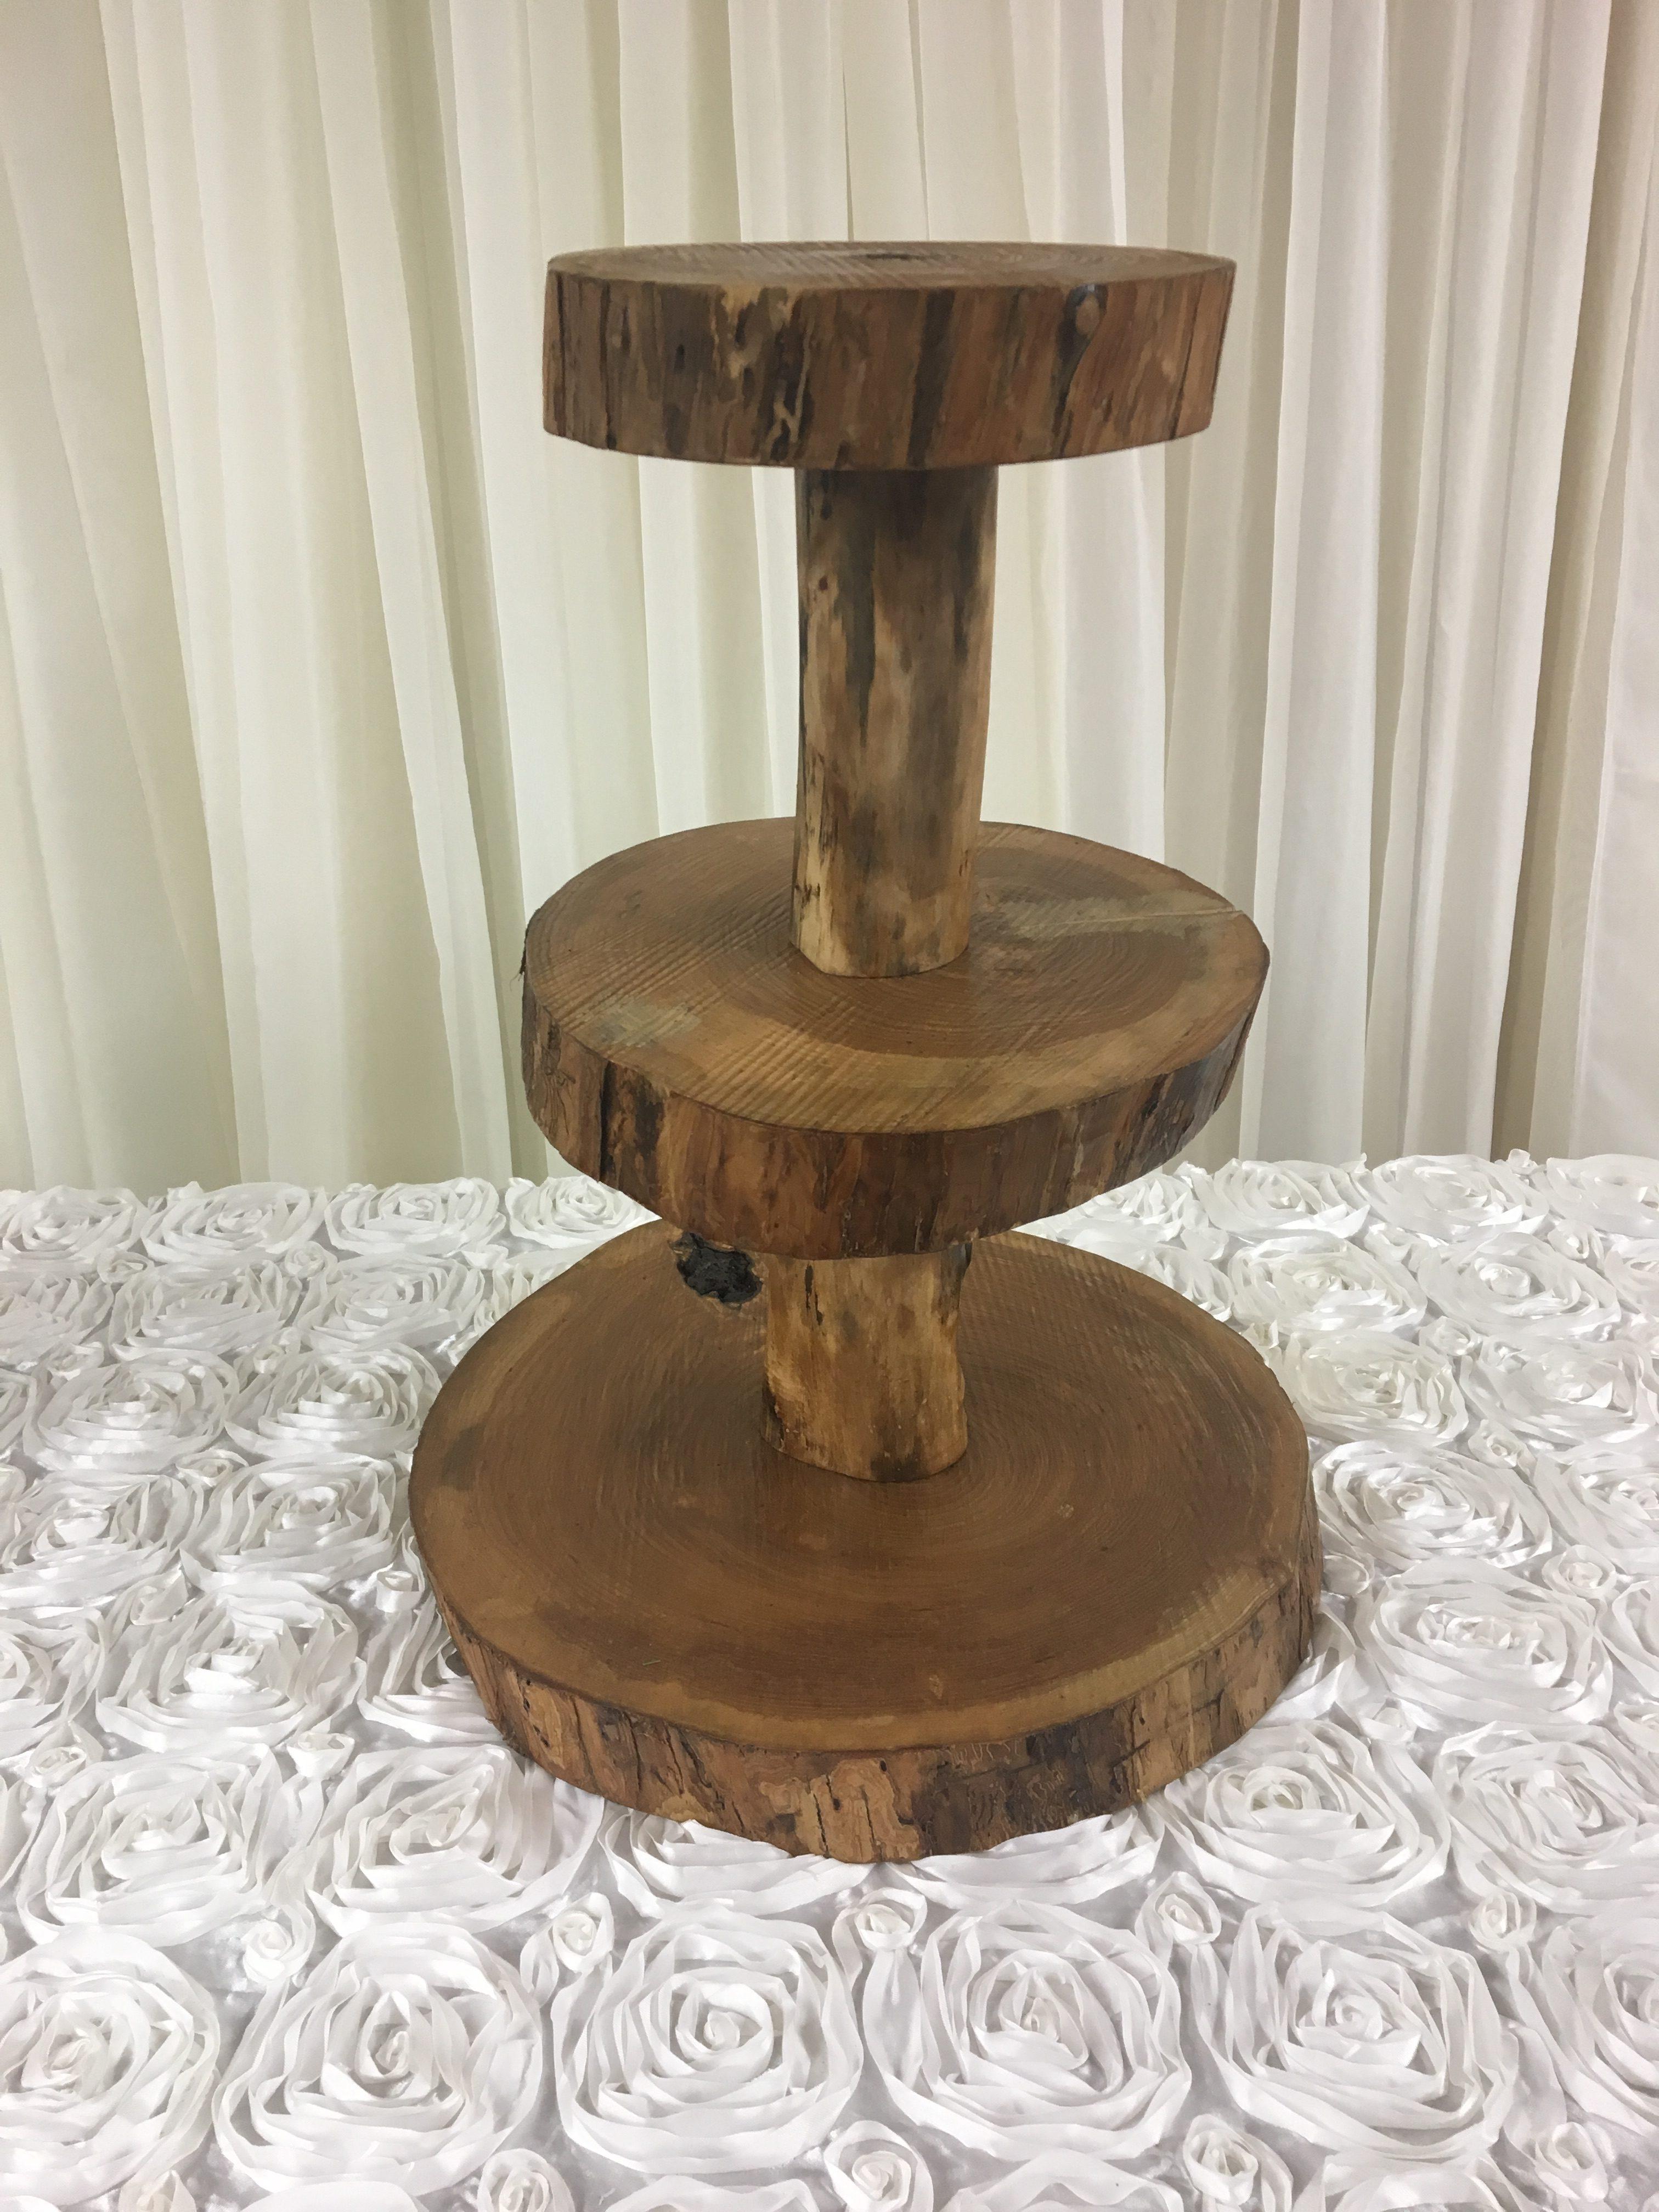 Log Cupcake Stand Image